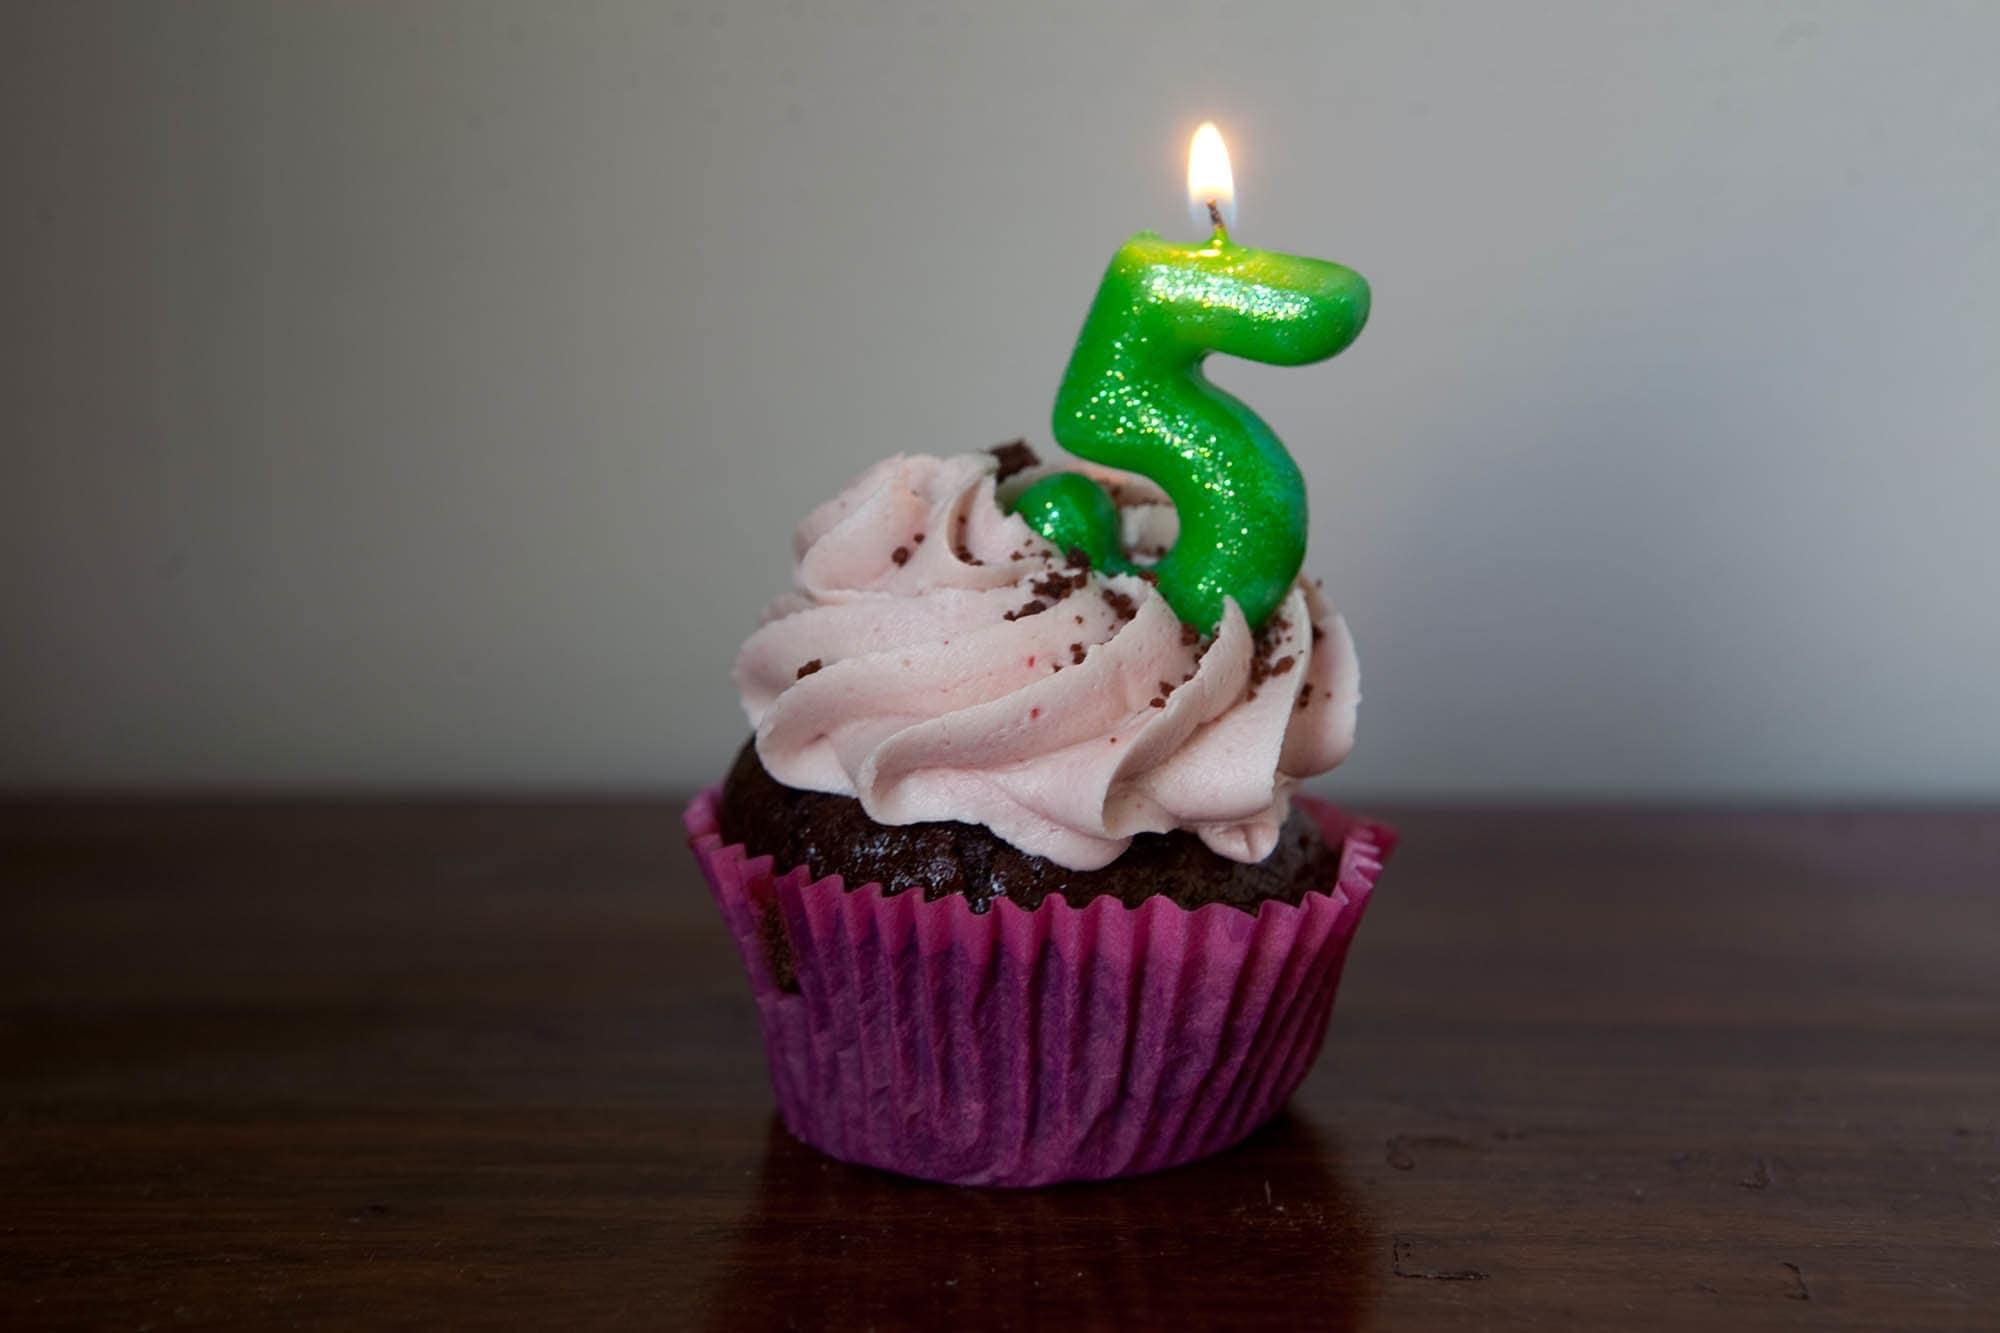 Happy Birthday Blog! Five years of blogging.